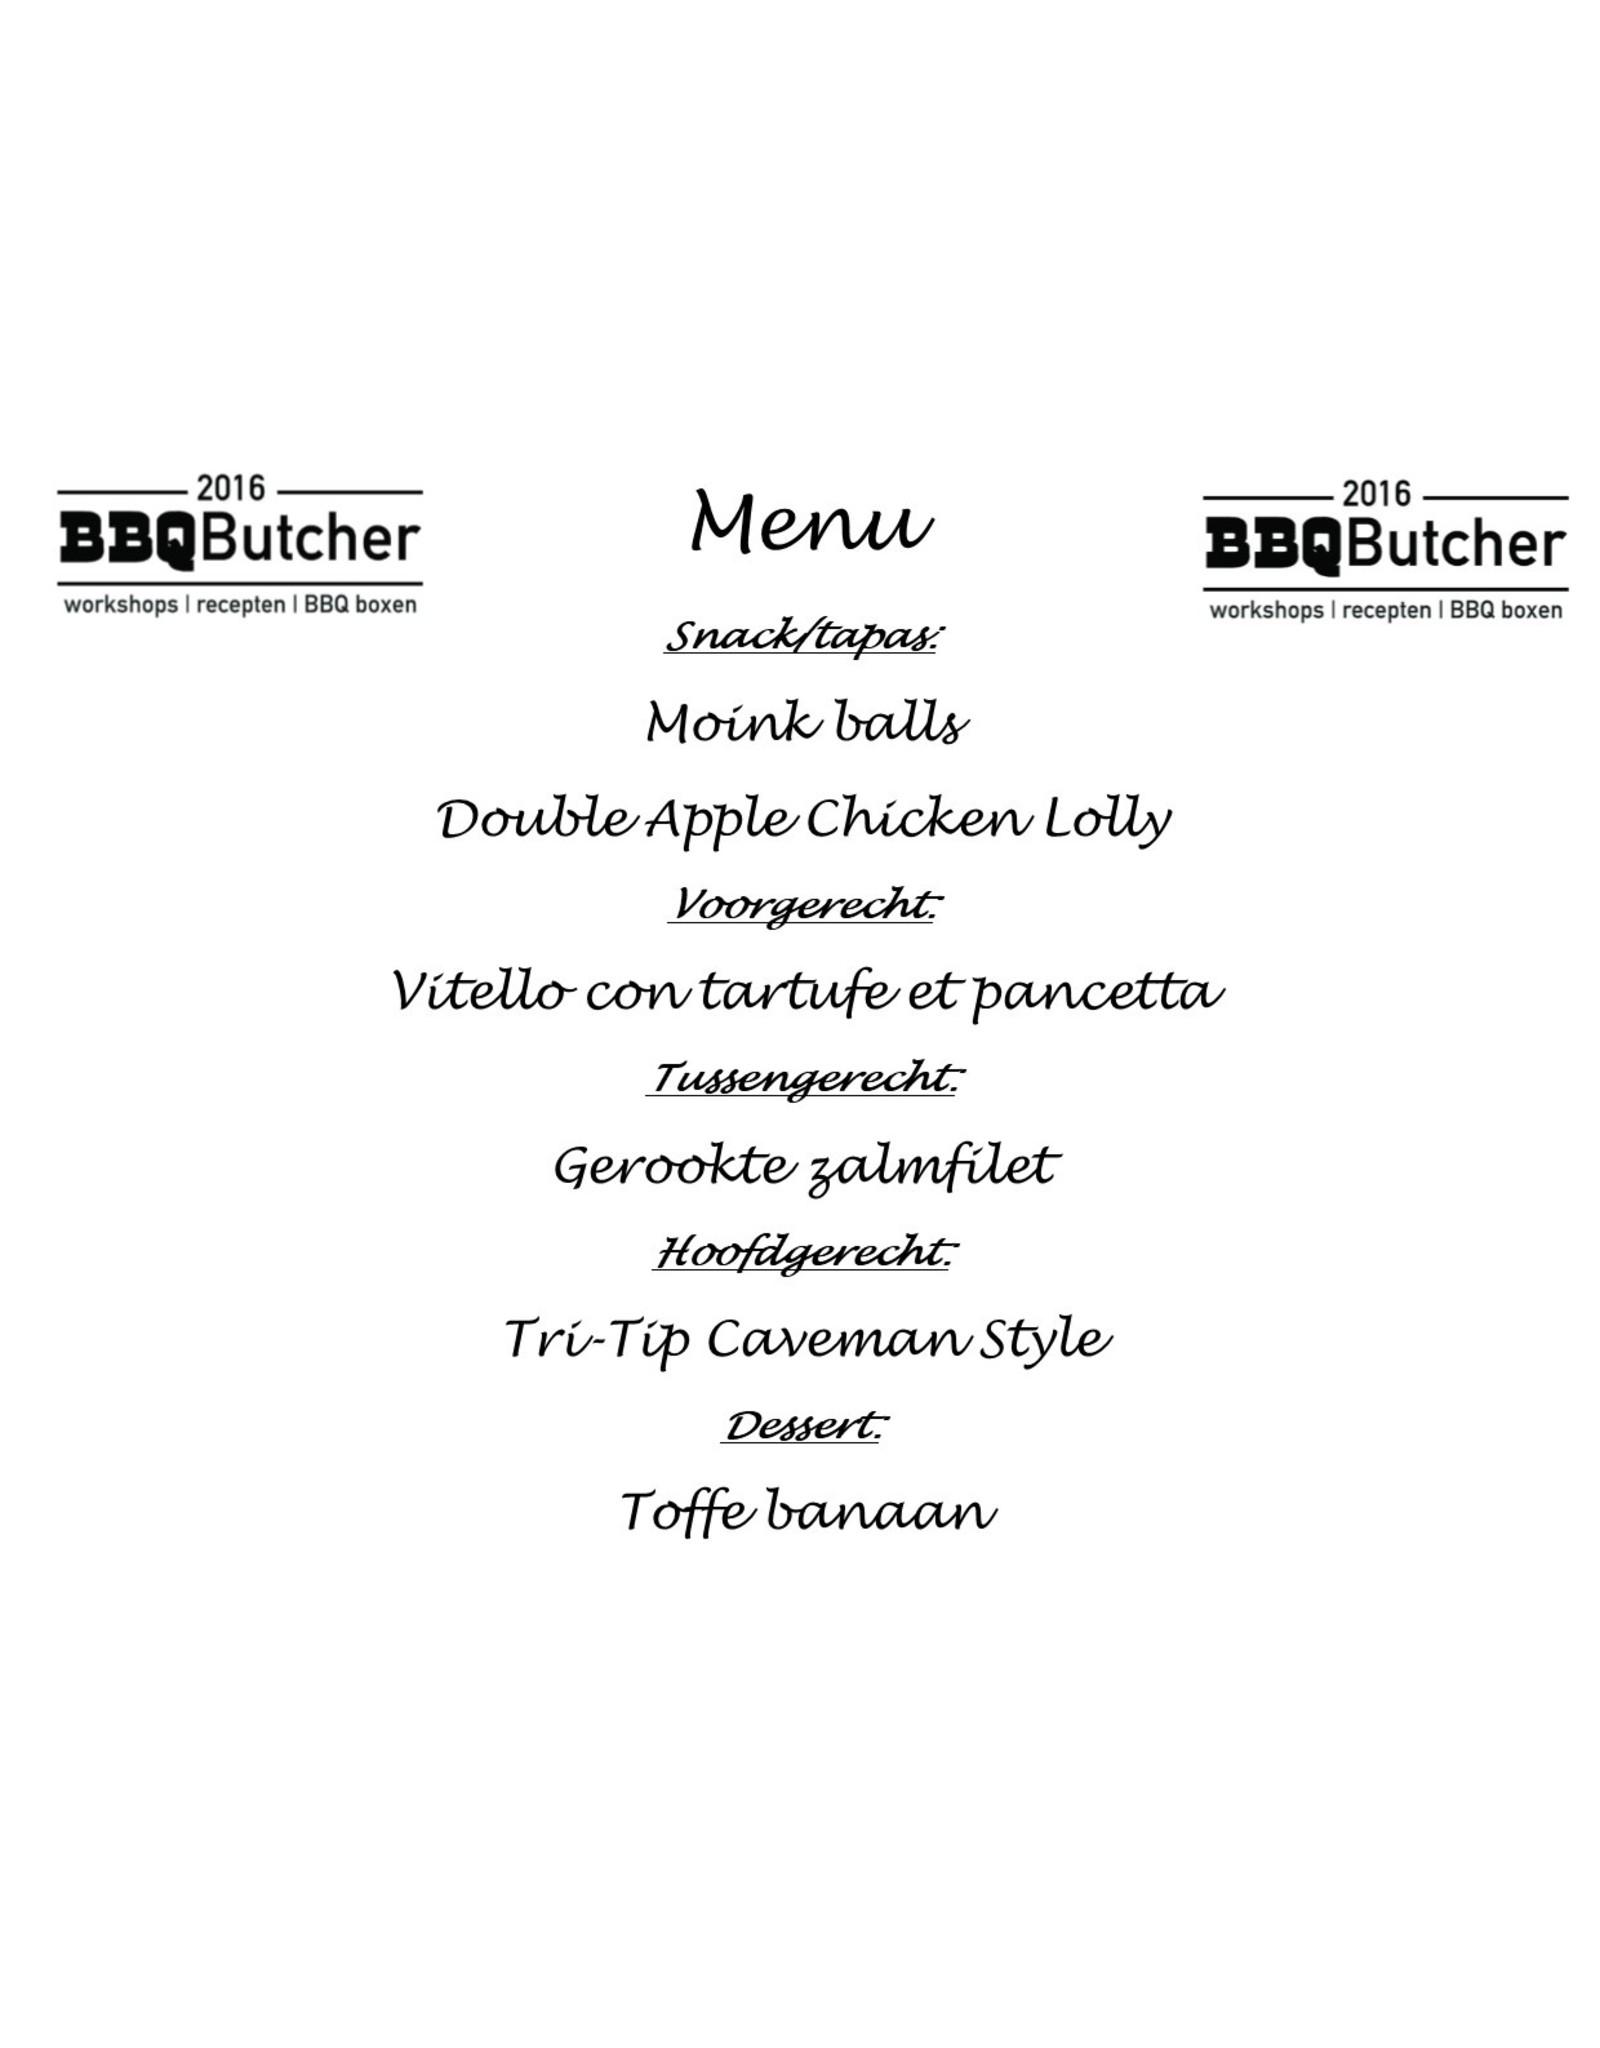 BBQ Butcher#1 Workshop  01-05-2021